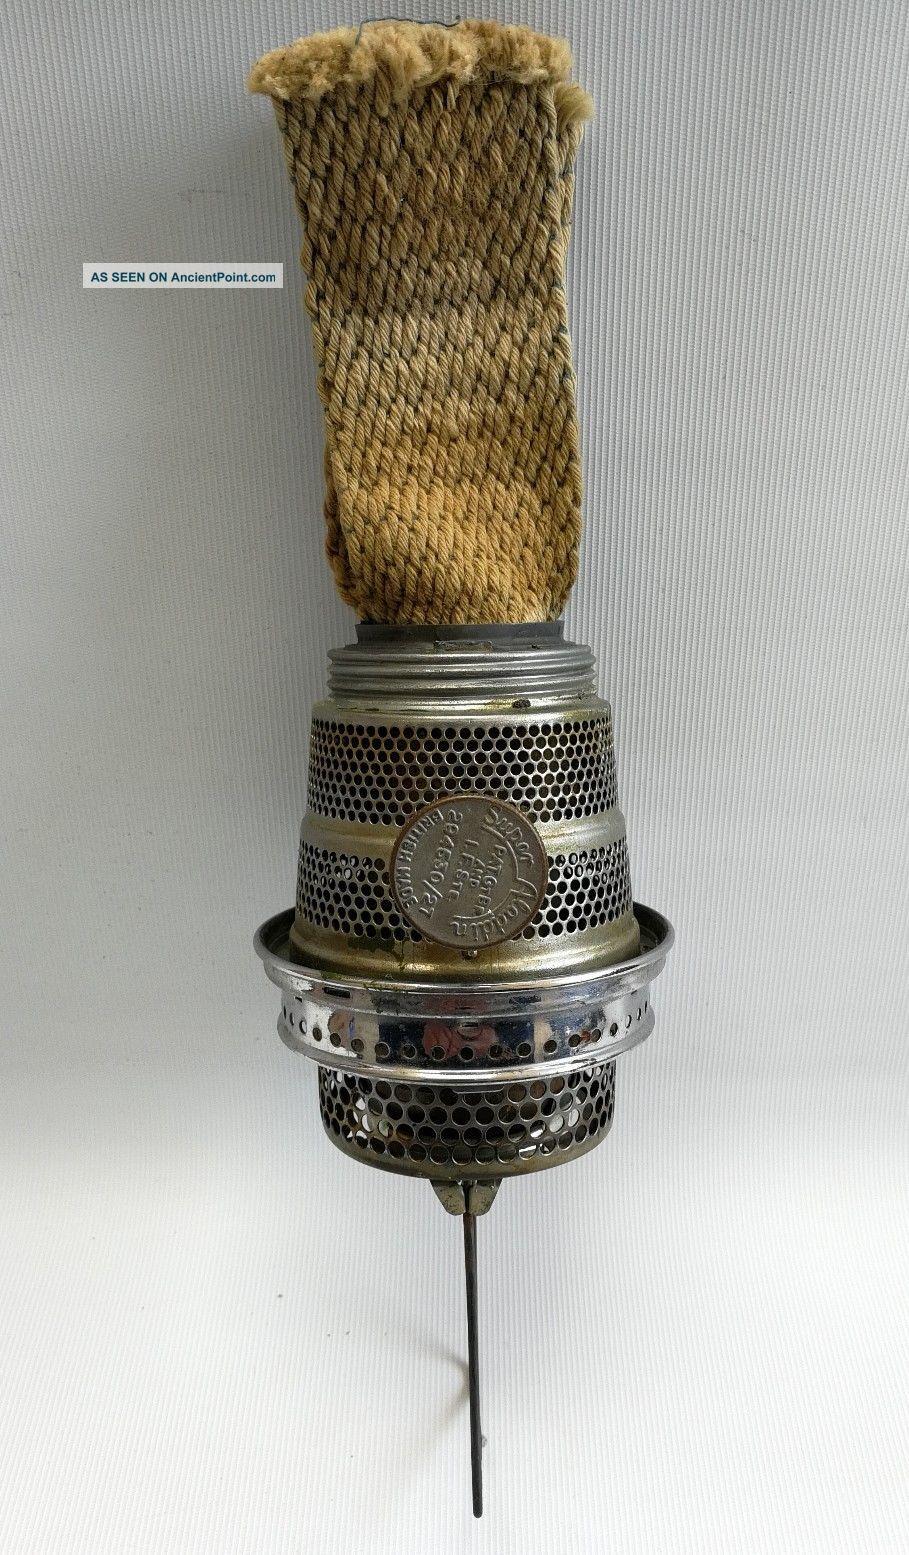 Vtg Aladdin (model 27) Oil Lamp Burner With Loxon Gallery - Nickel Plate 20th Century photo